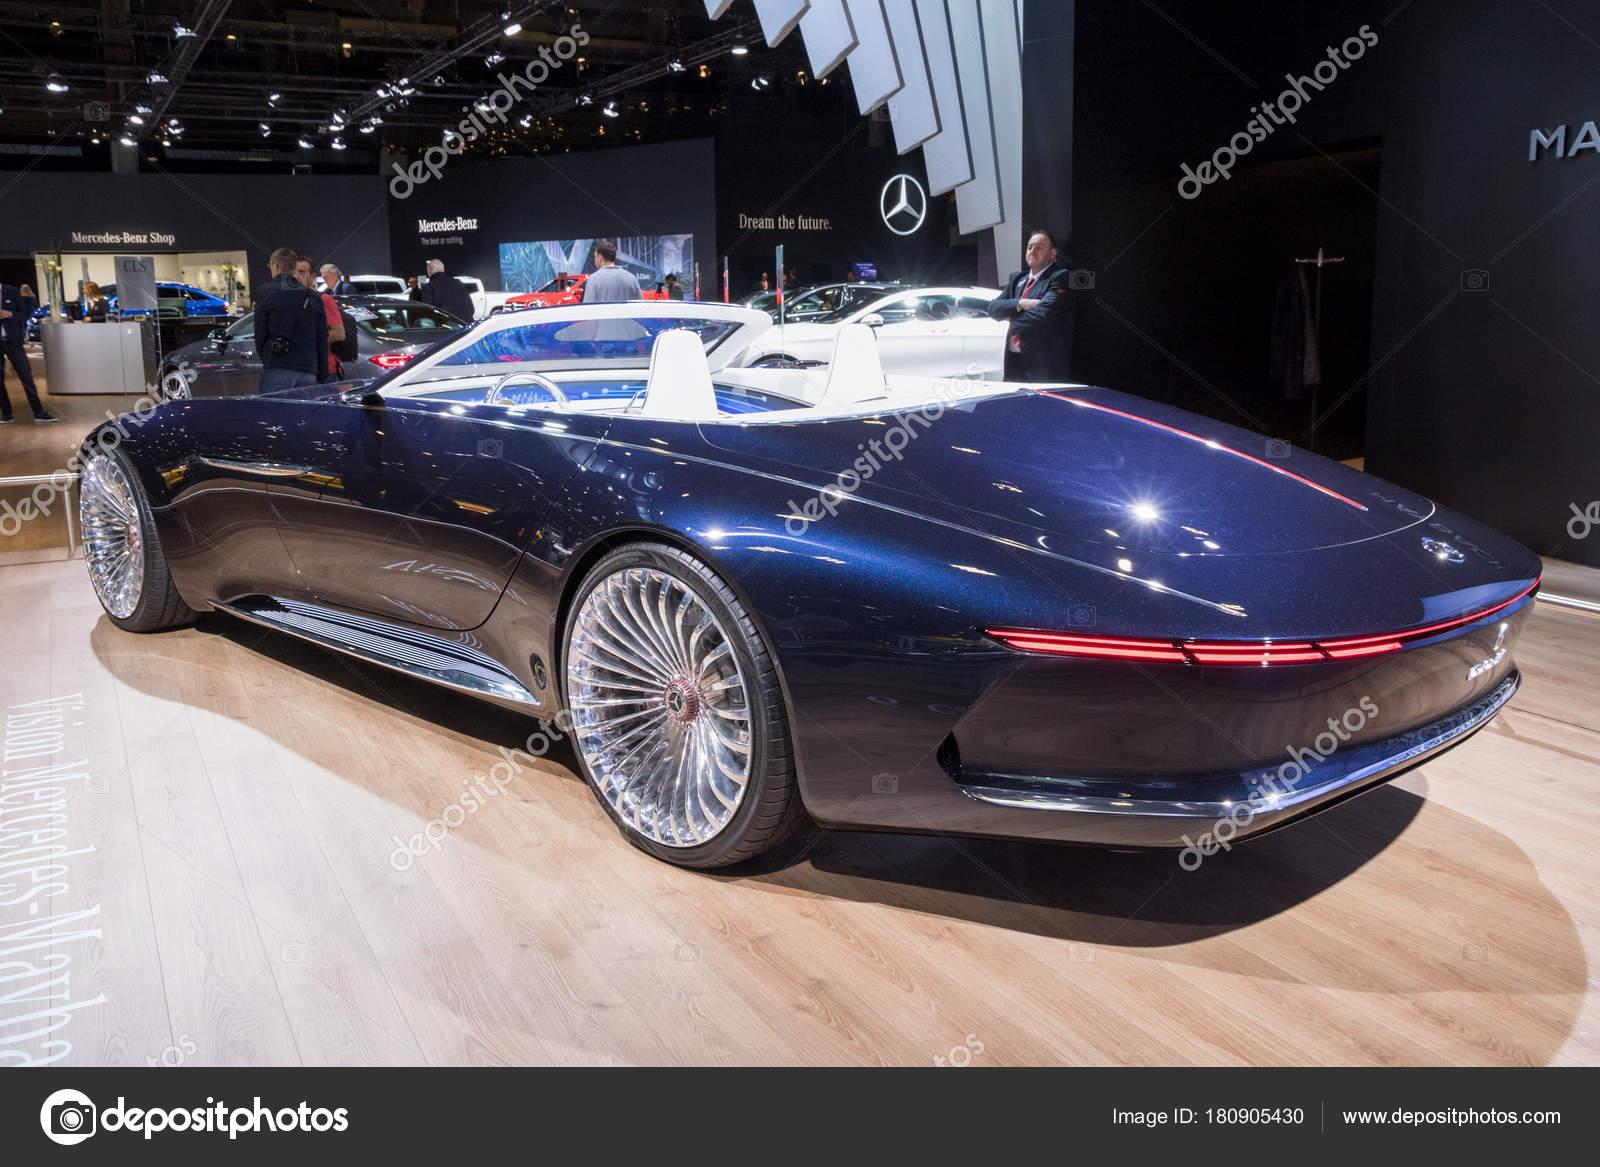 brüssel januar 2018 vision mercedes maybach cabrio auto präsentiert